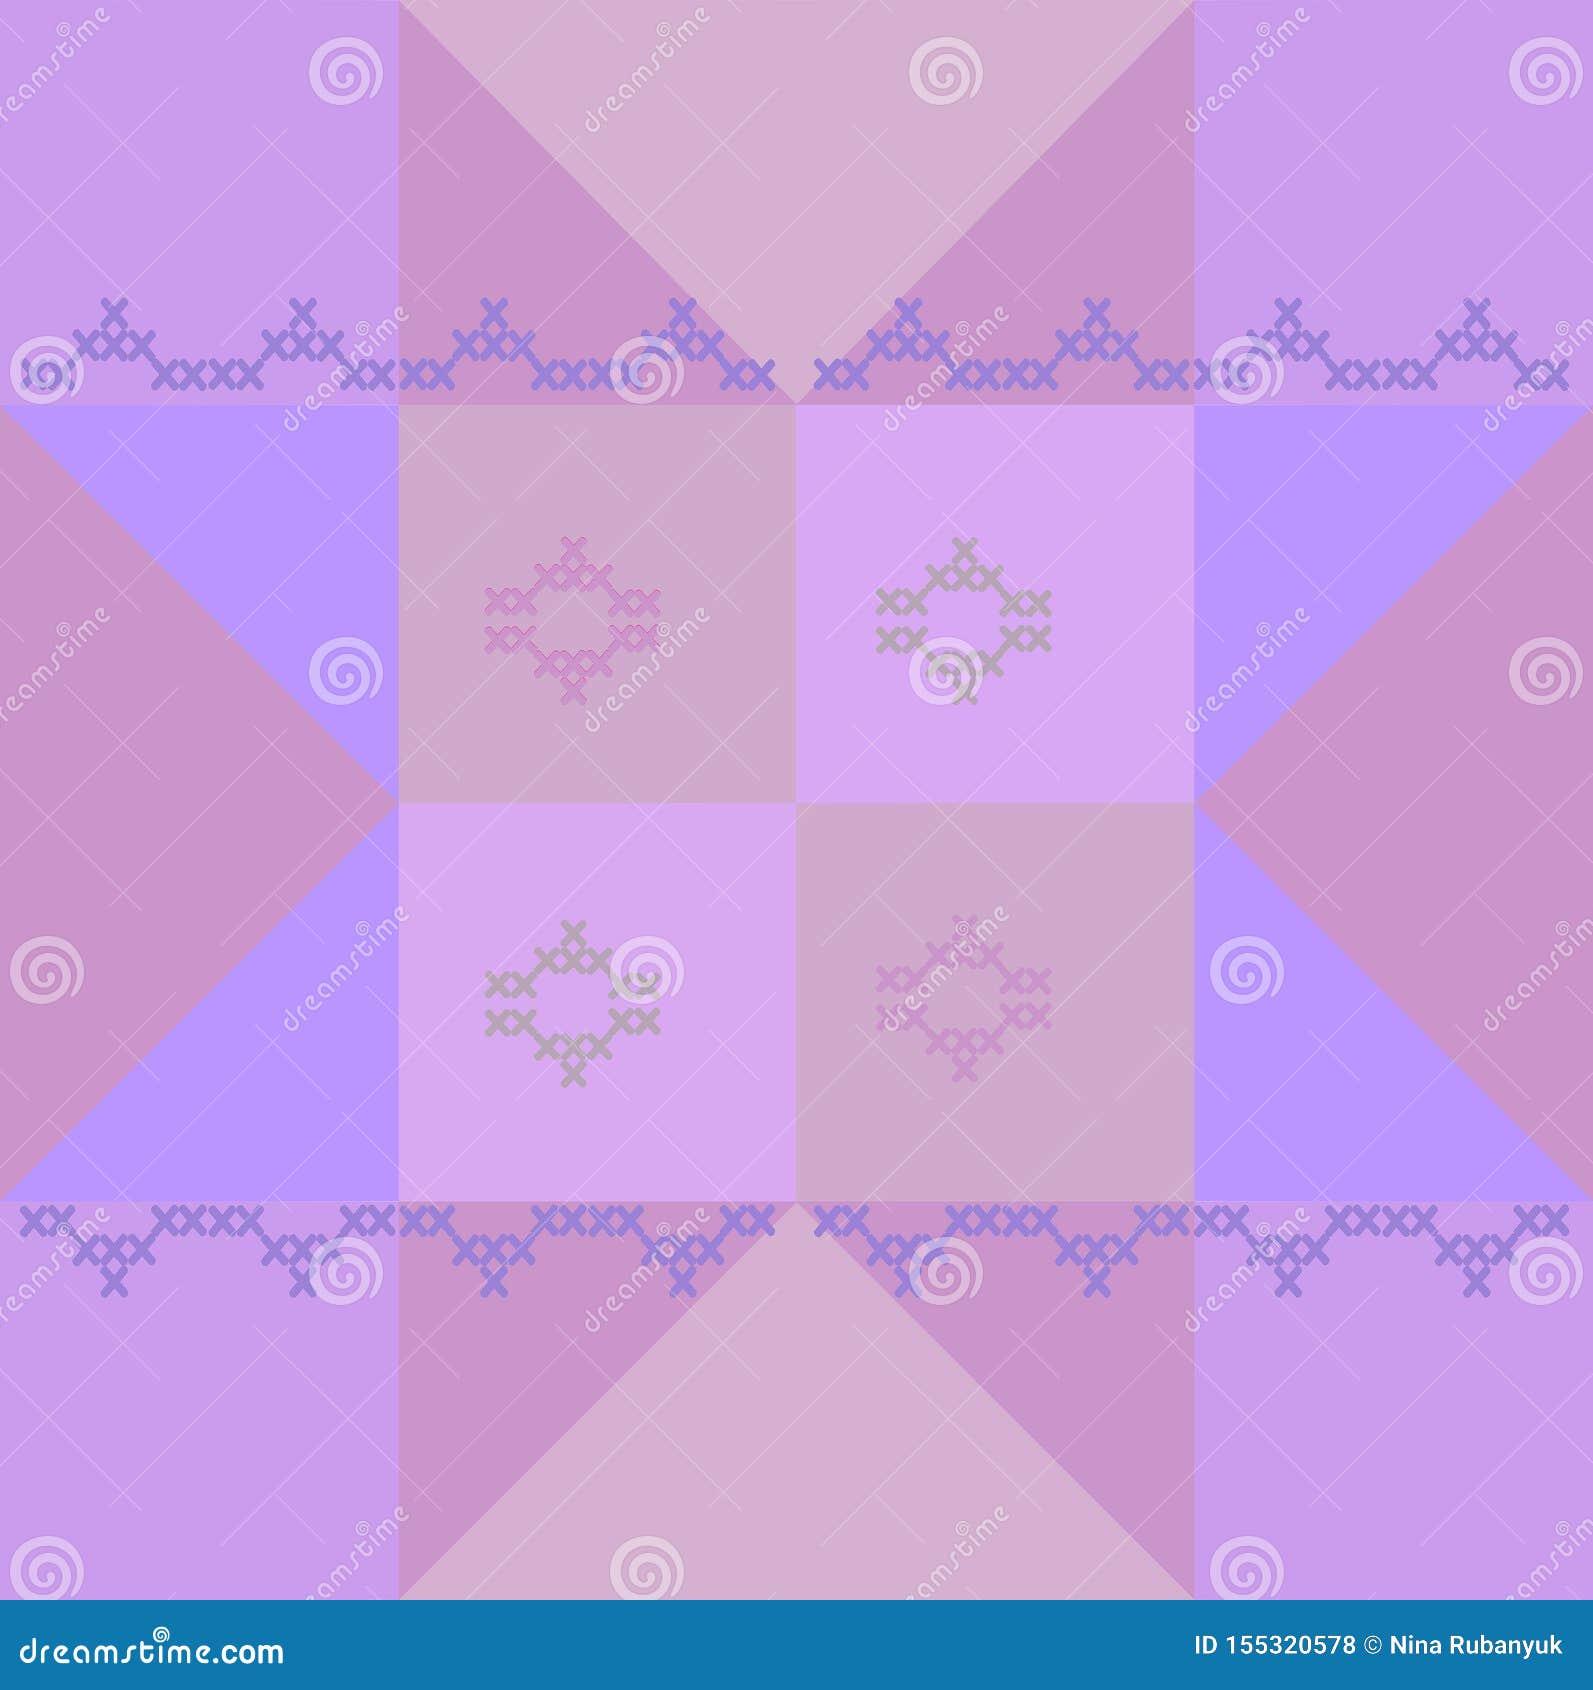 Geometric block pattern for patchwork